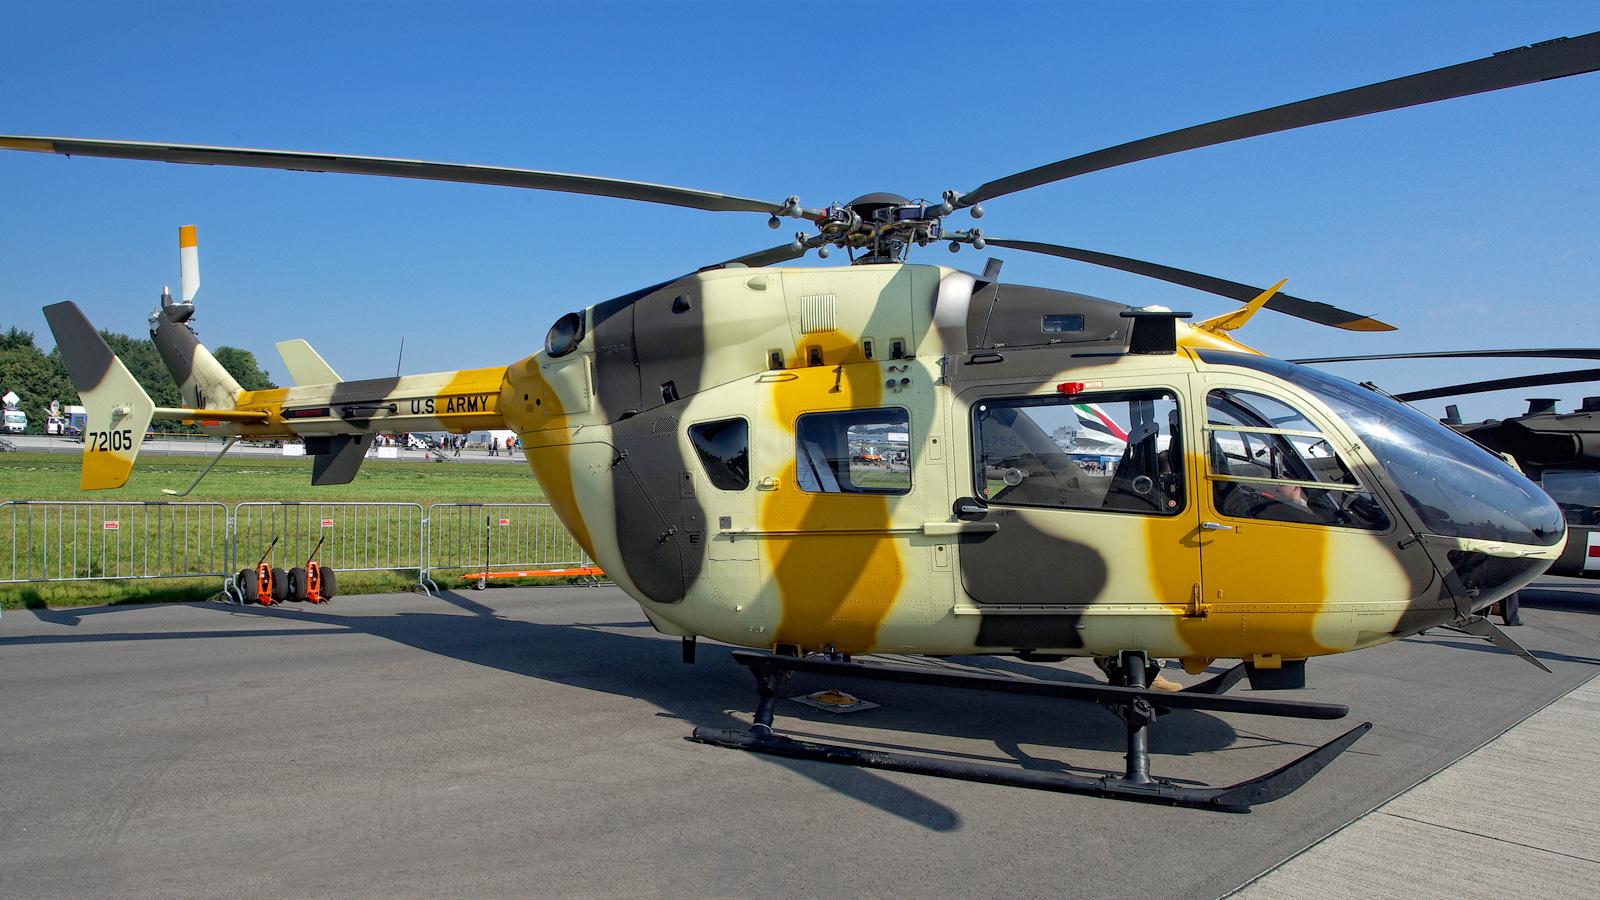 IMGP7822-7823-Eurocopter-Kawasaki-UH-72A